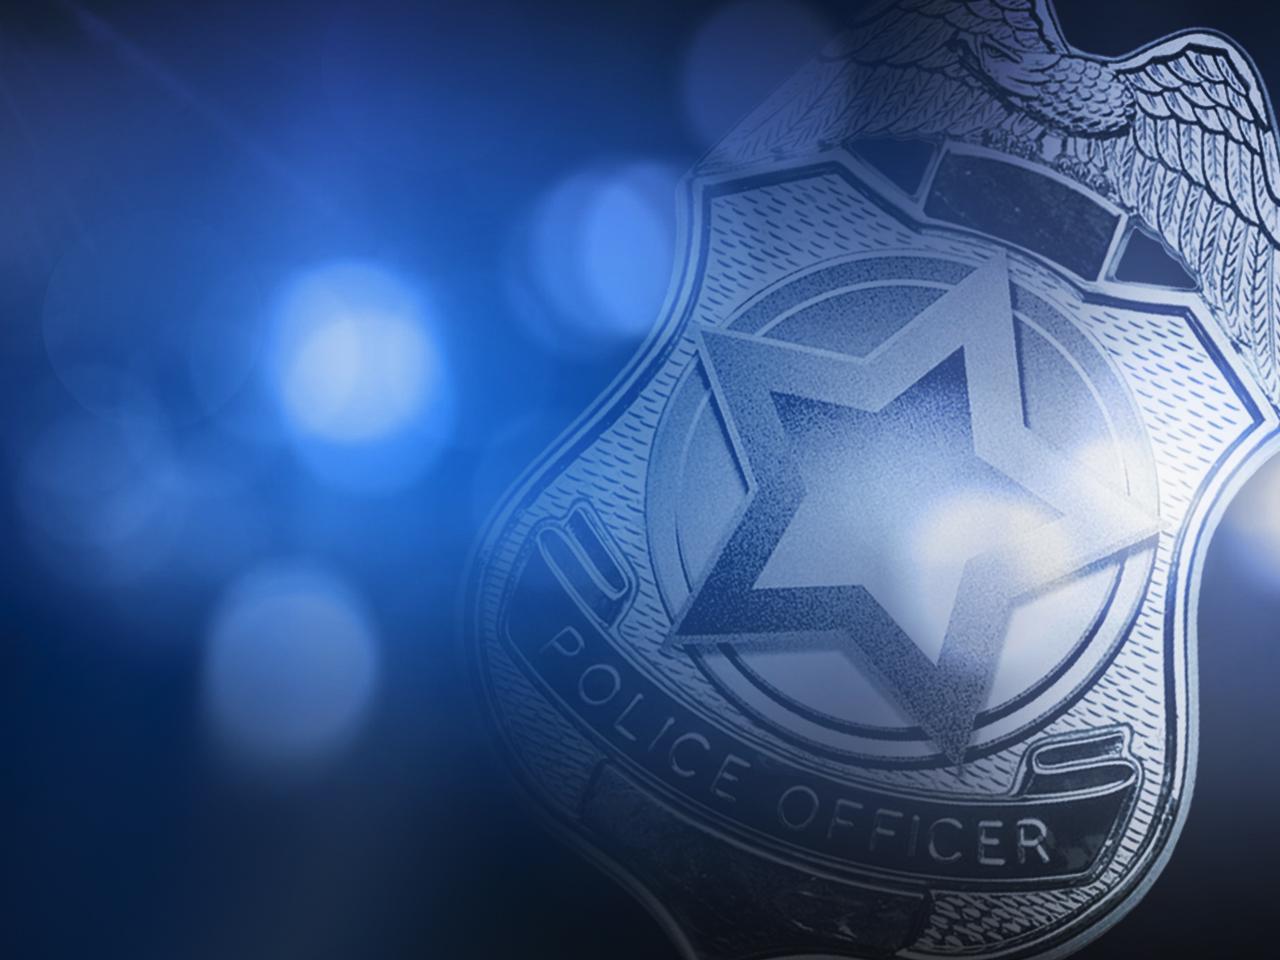 police badgee_1553036980712.jpg.jpg